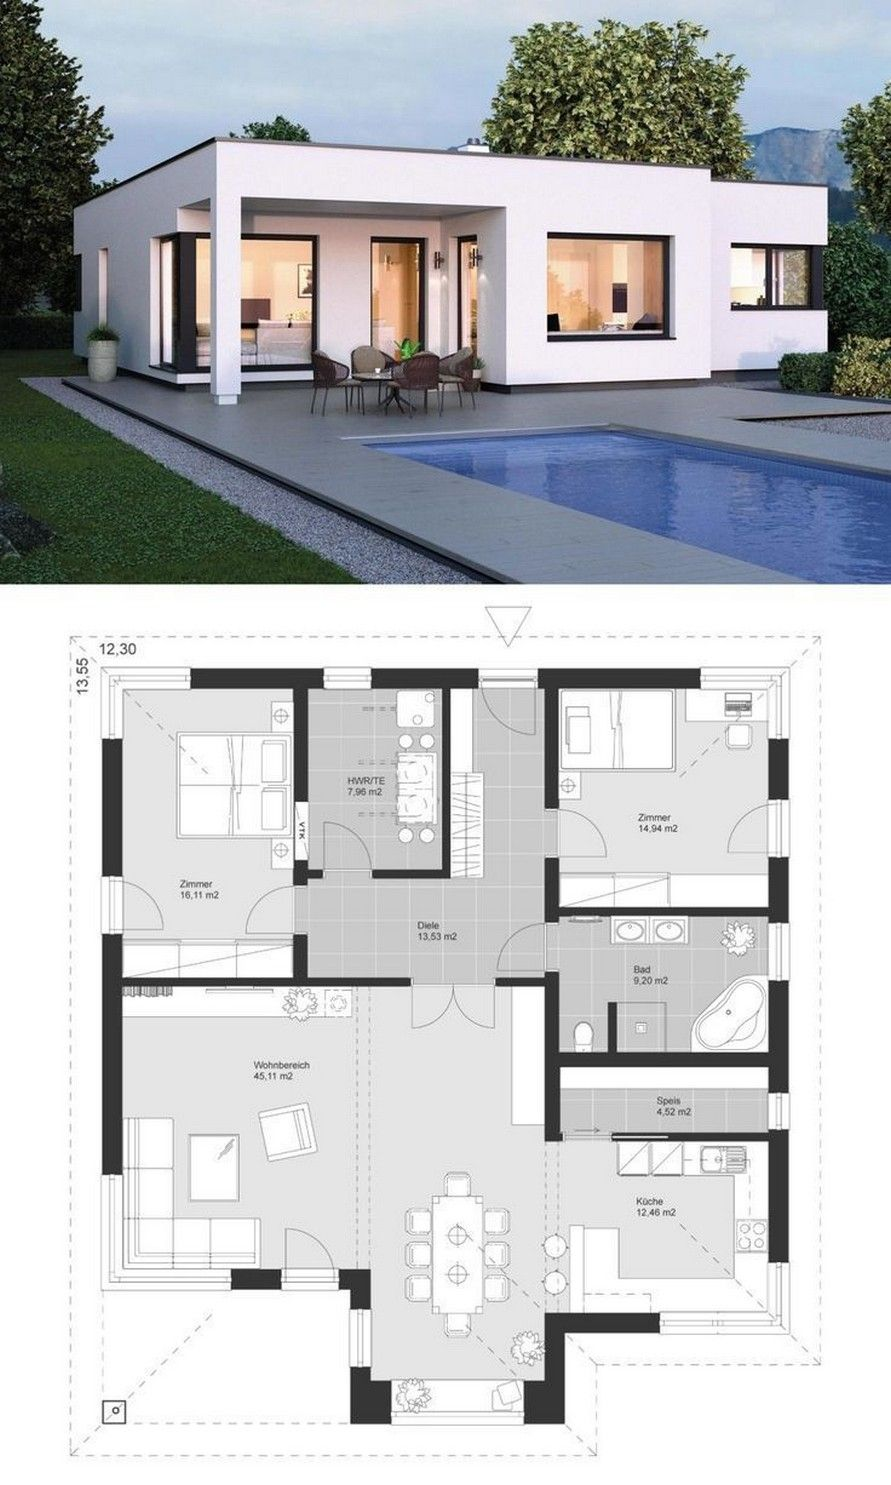 45 Inspiring Modern House Design Ideas In 2020 31 In 2020 Bungalow House Plans Modern Bungalow House Architecture Design